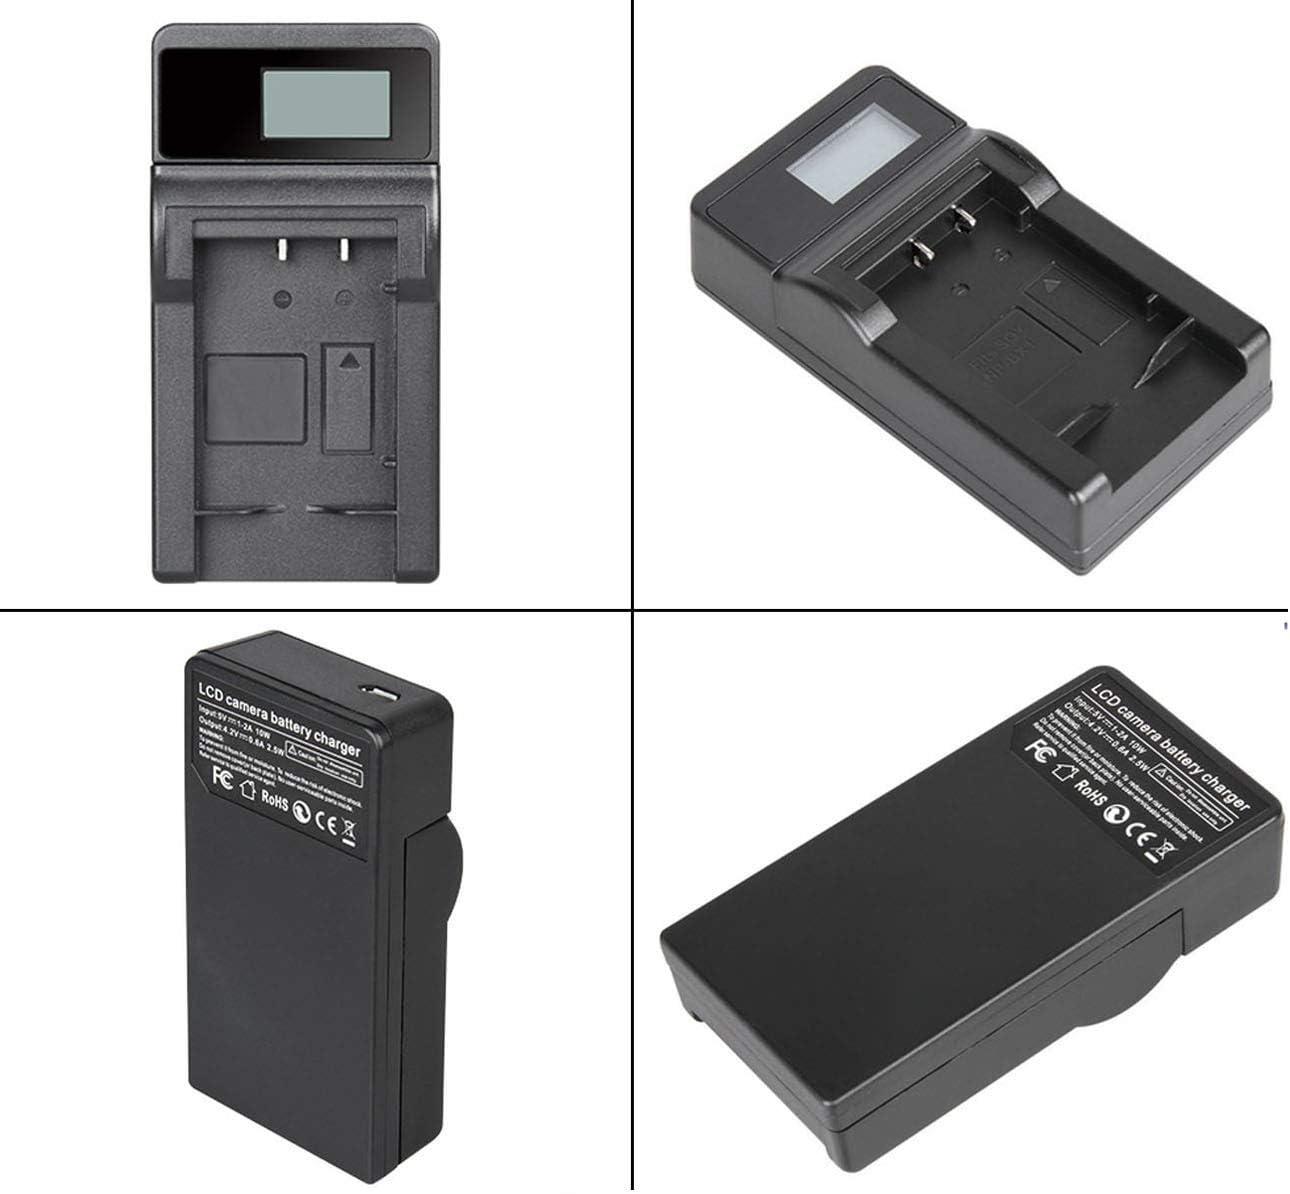 VP-DC565WB Battery Pack USB Charger for Samsung VP-DC565W VP-DC565Wi VP-DC565WBi Digital Camcorder